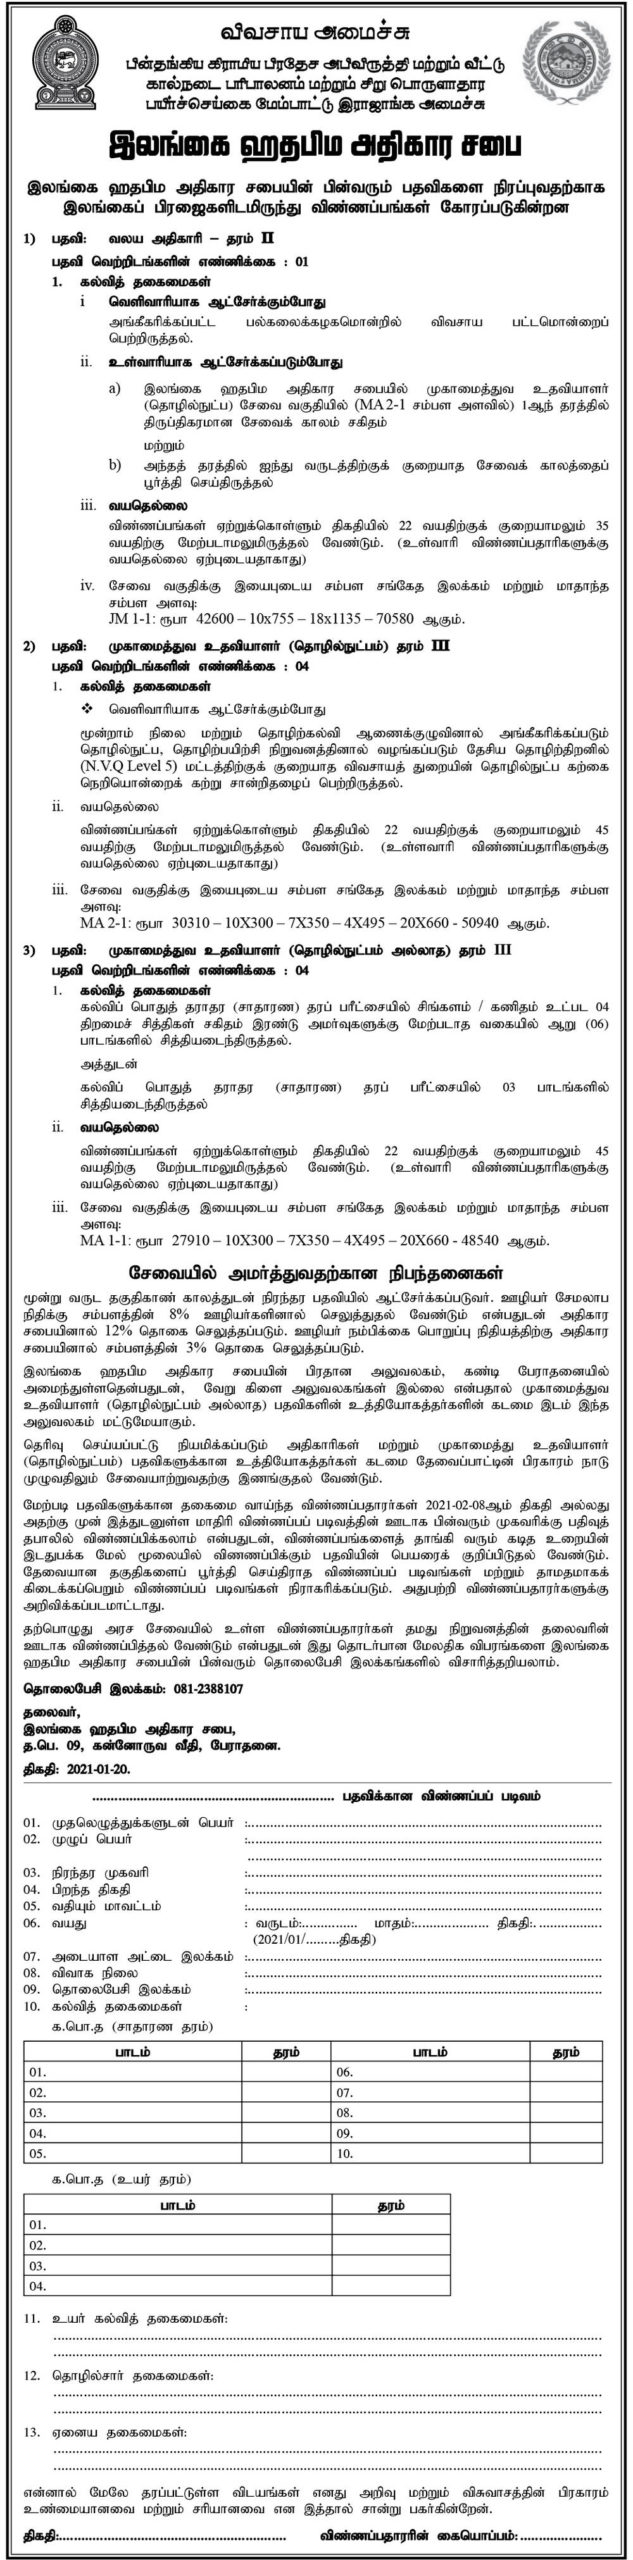 Zonal Officer, Management Assistant - Hadabima Authority Of Sri Lanka